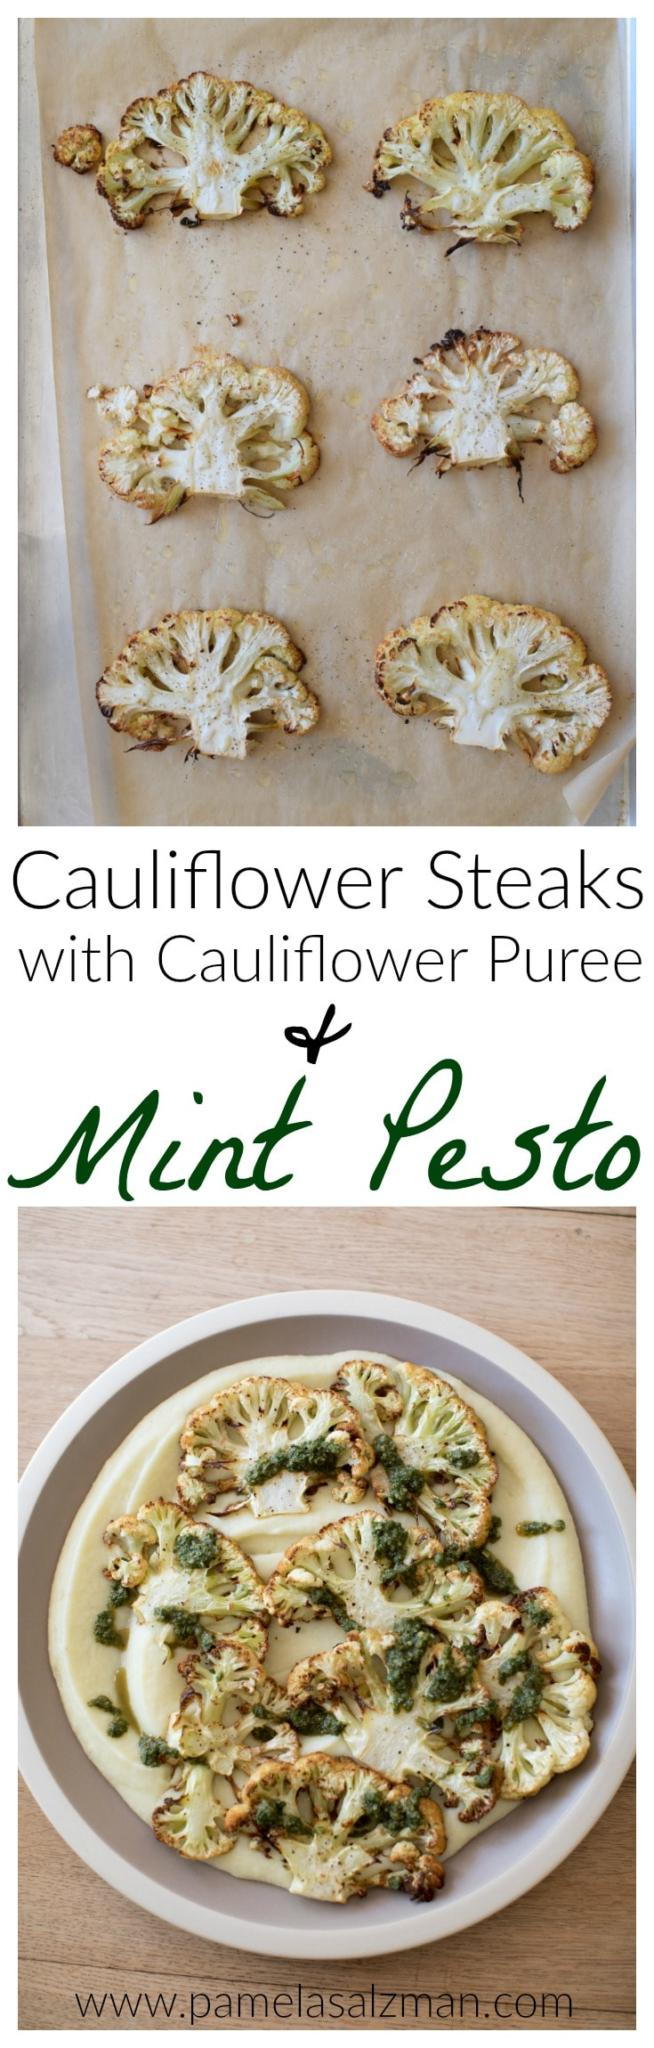 Cauliflower Steaks with Cauliflower Puree and Mint Pesto   Pamela Salzman